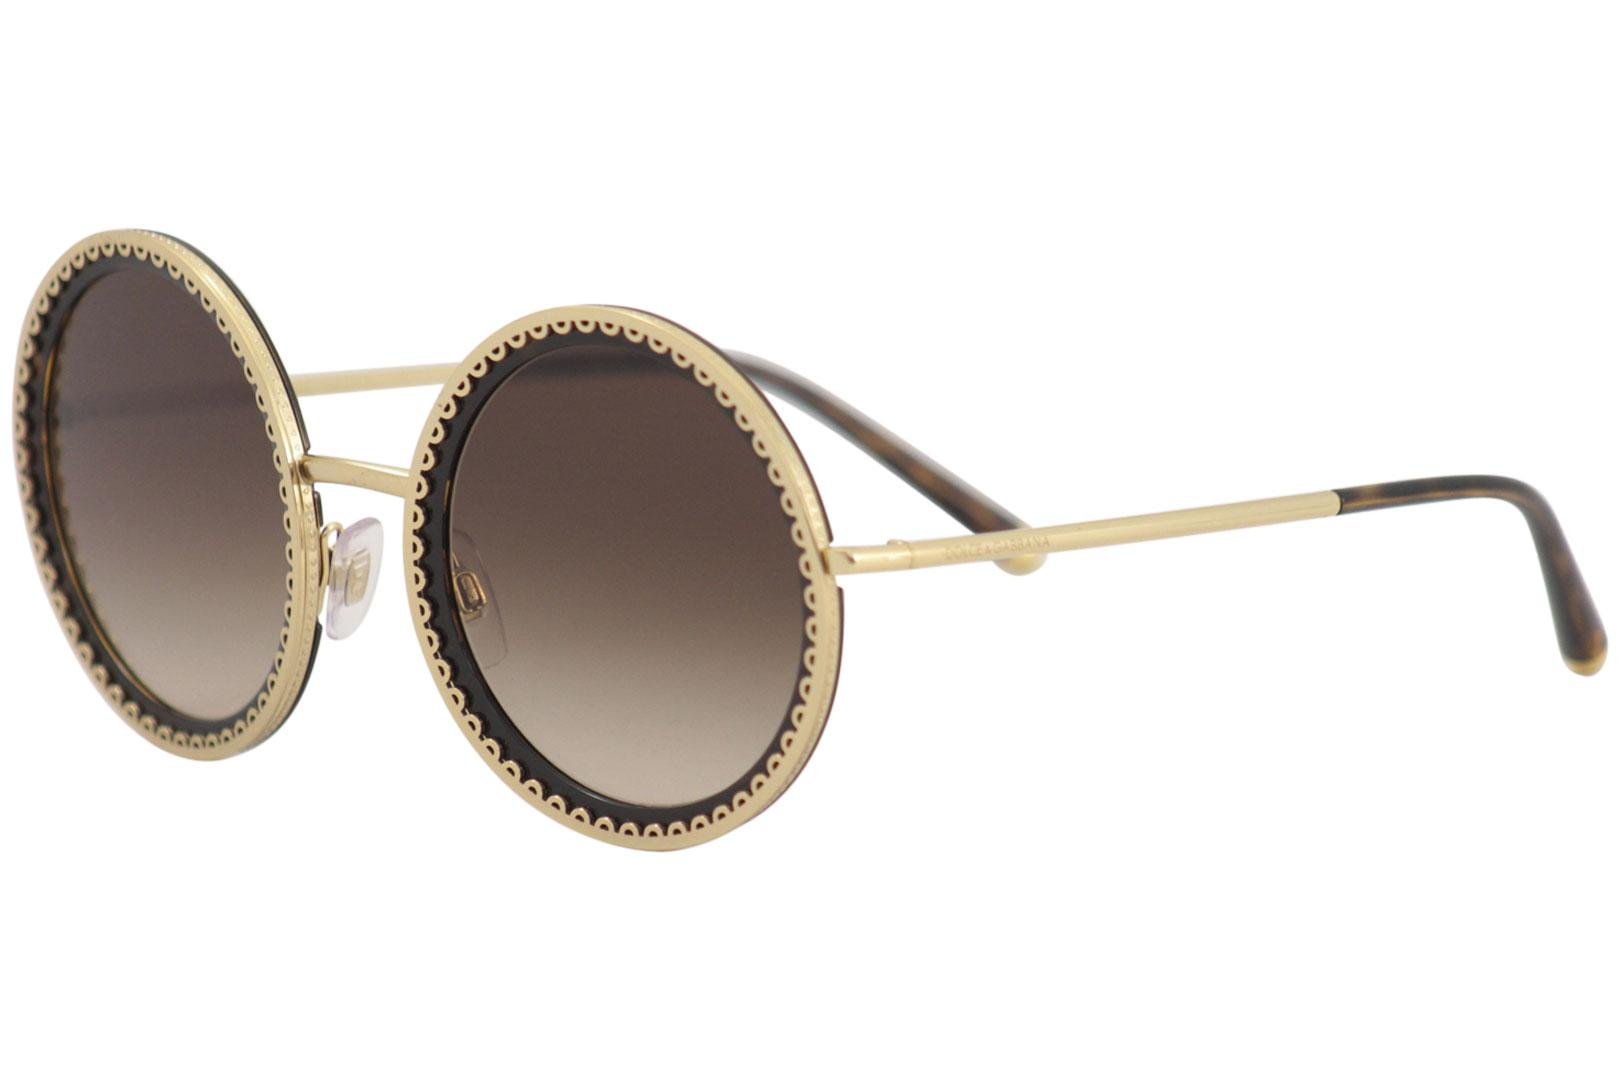 75a34a824019 Dolce   Gabbana Women s D G DG2211 DG 2211 Fashion Round Sunglasses